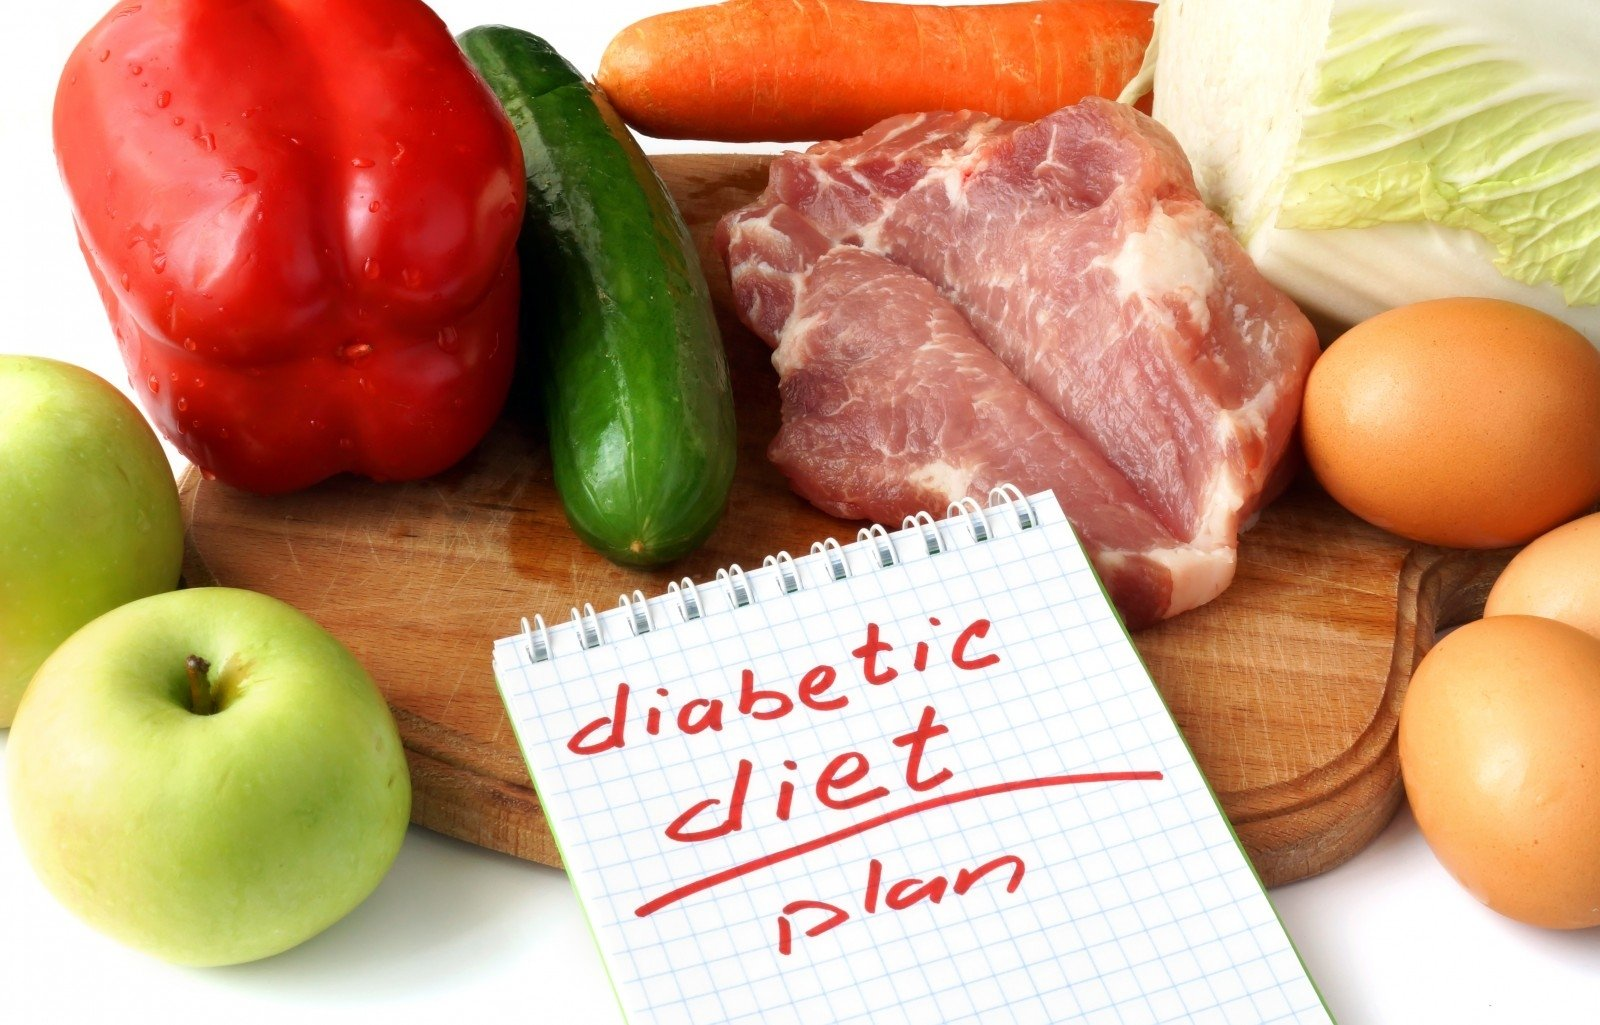 sergant hipertenzija, skiriama dieta